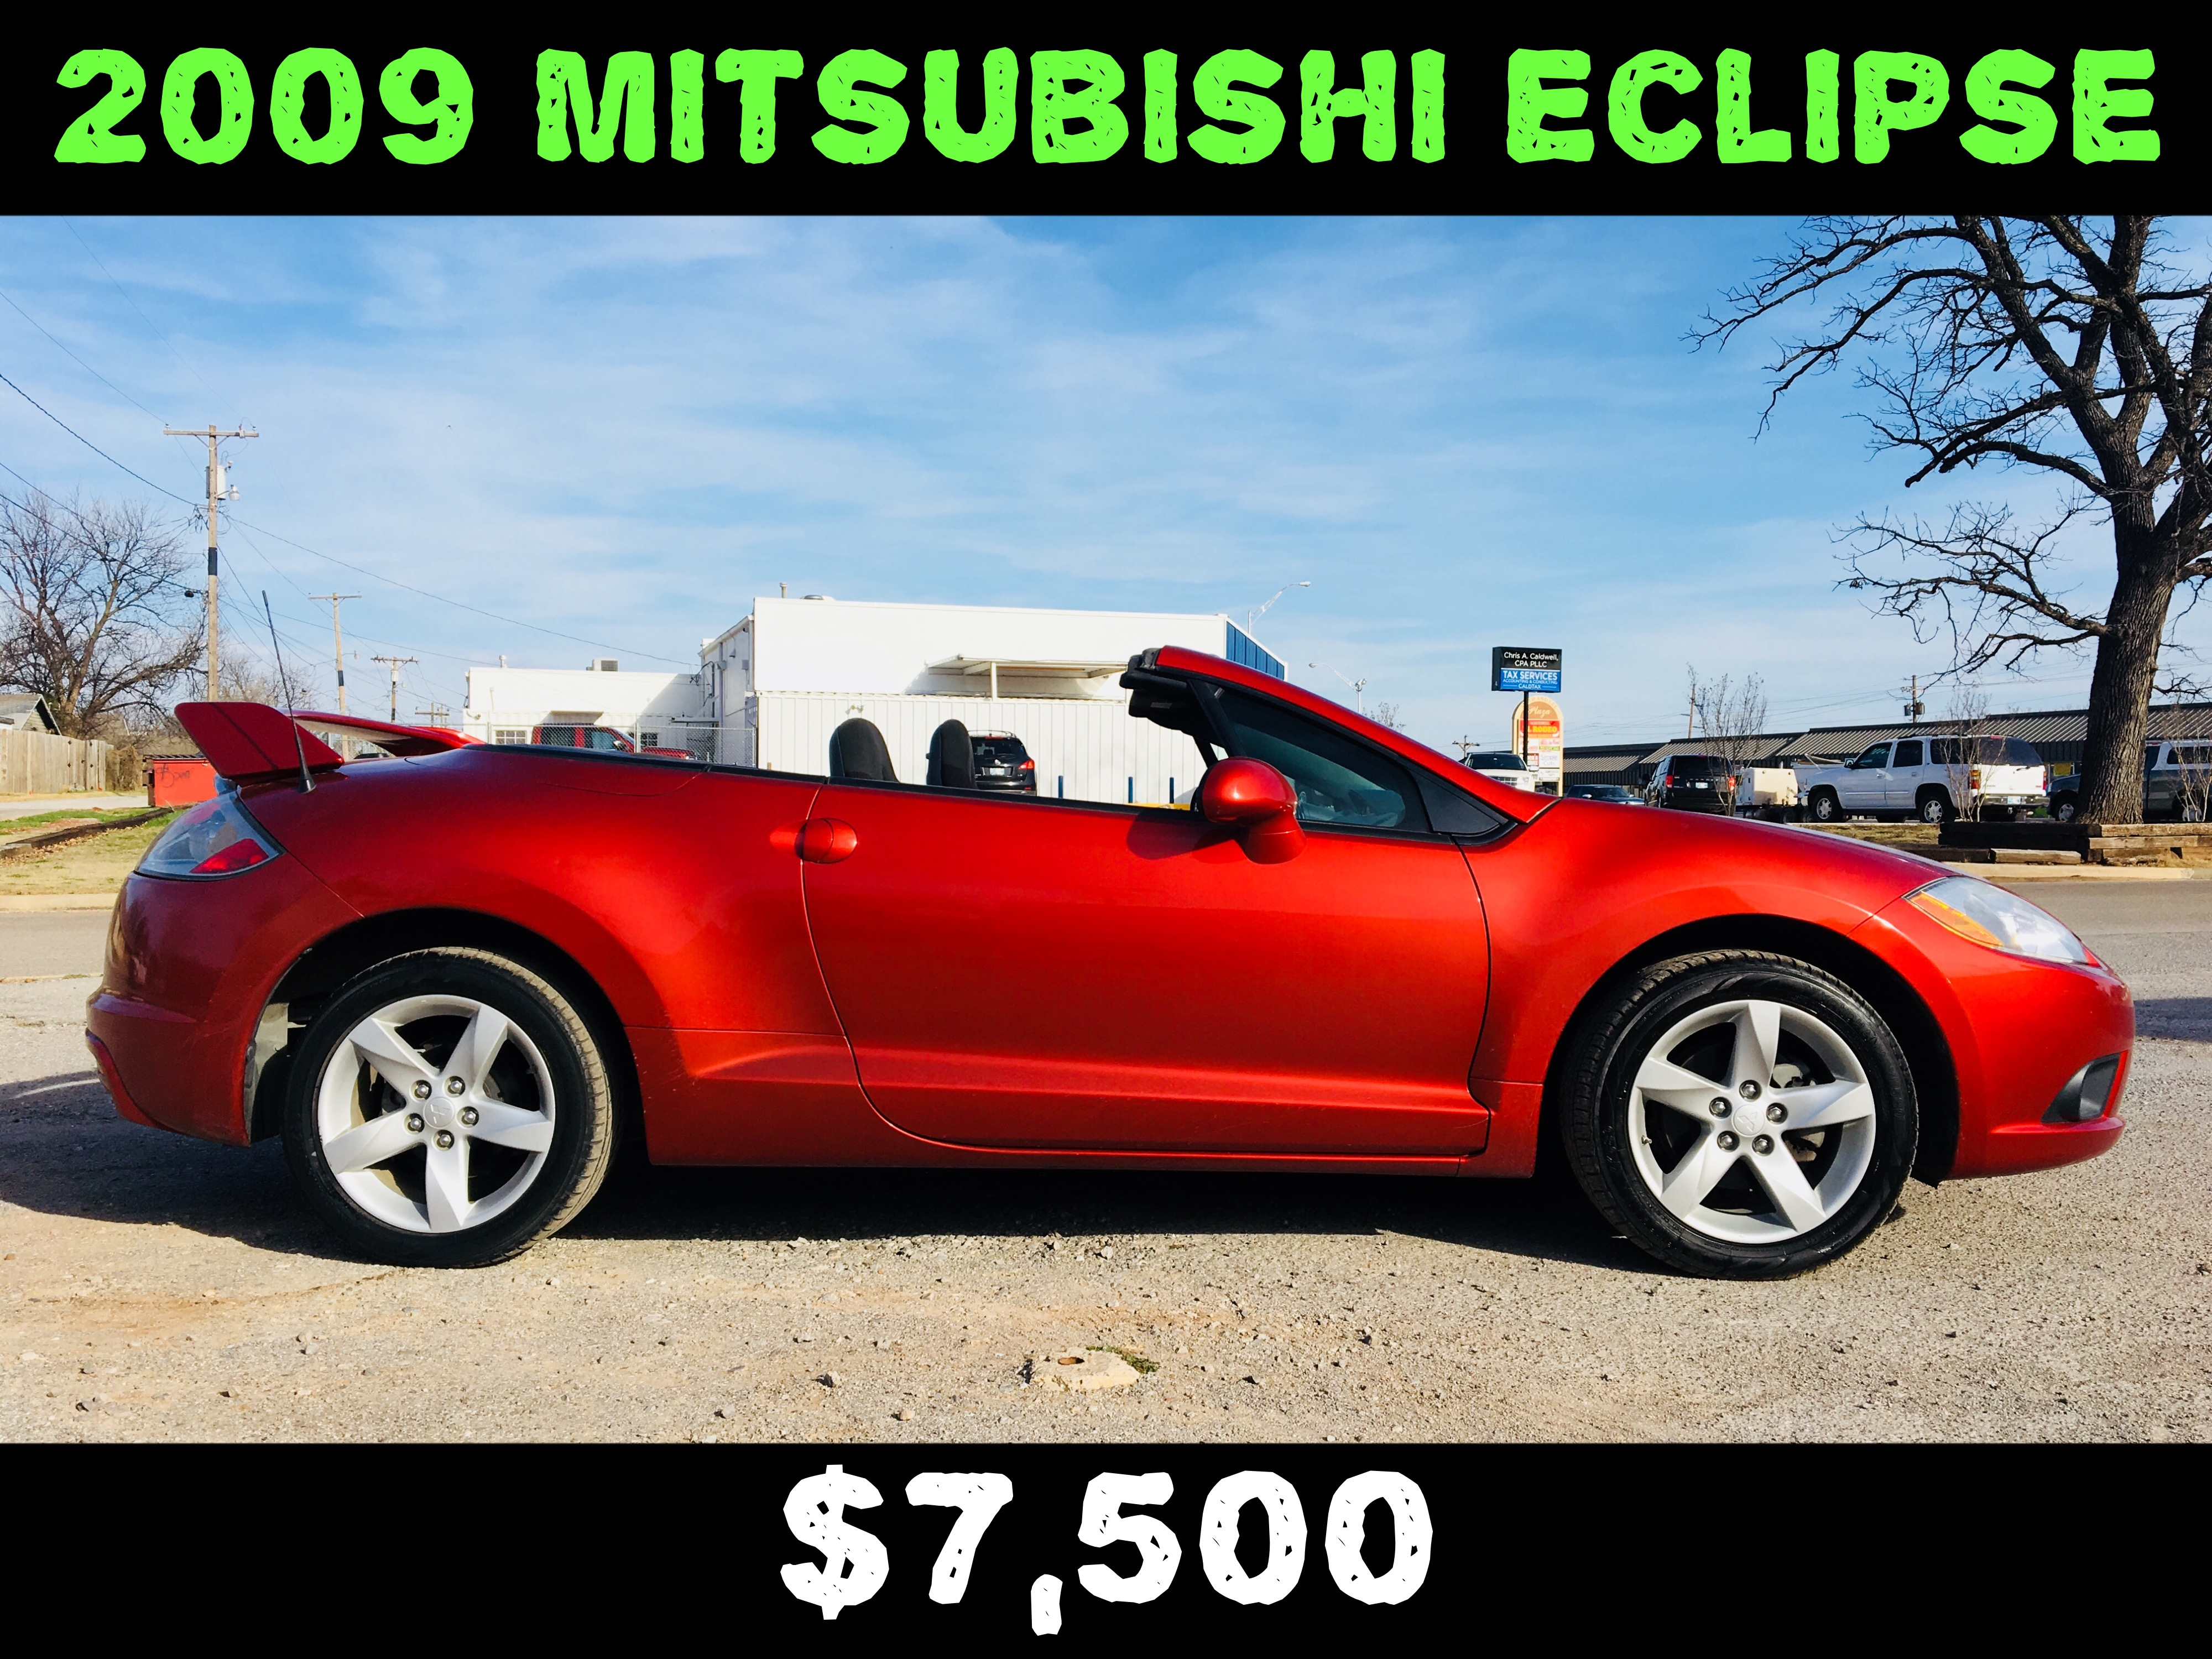 2009 Mitsubishi Eclipse Spyder  $7,500